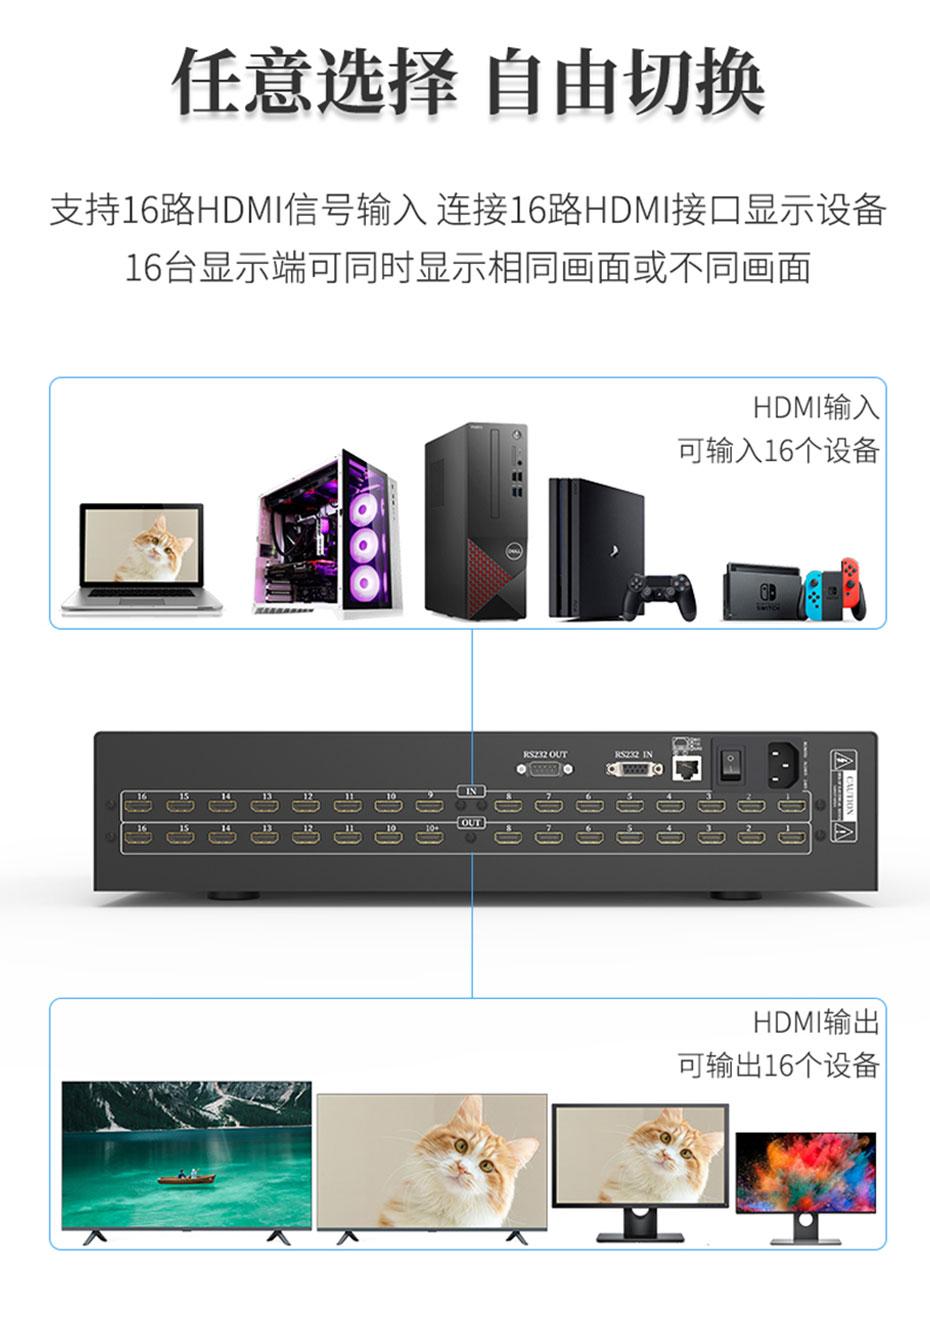 HDMI矩阵16进16出1616H随心切换输入与输出